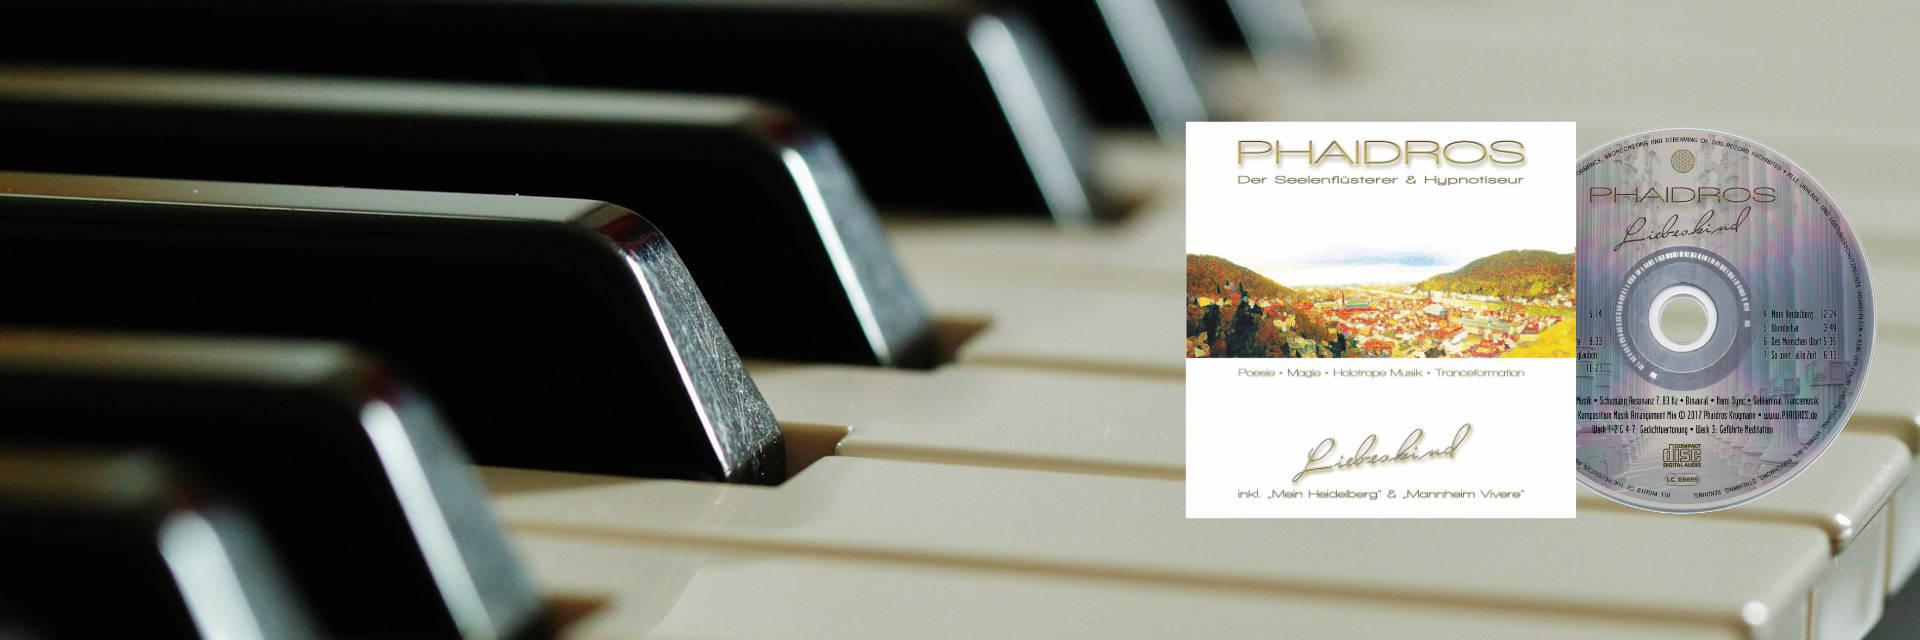 Hypnose Seminar Musik CD-Album